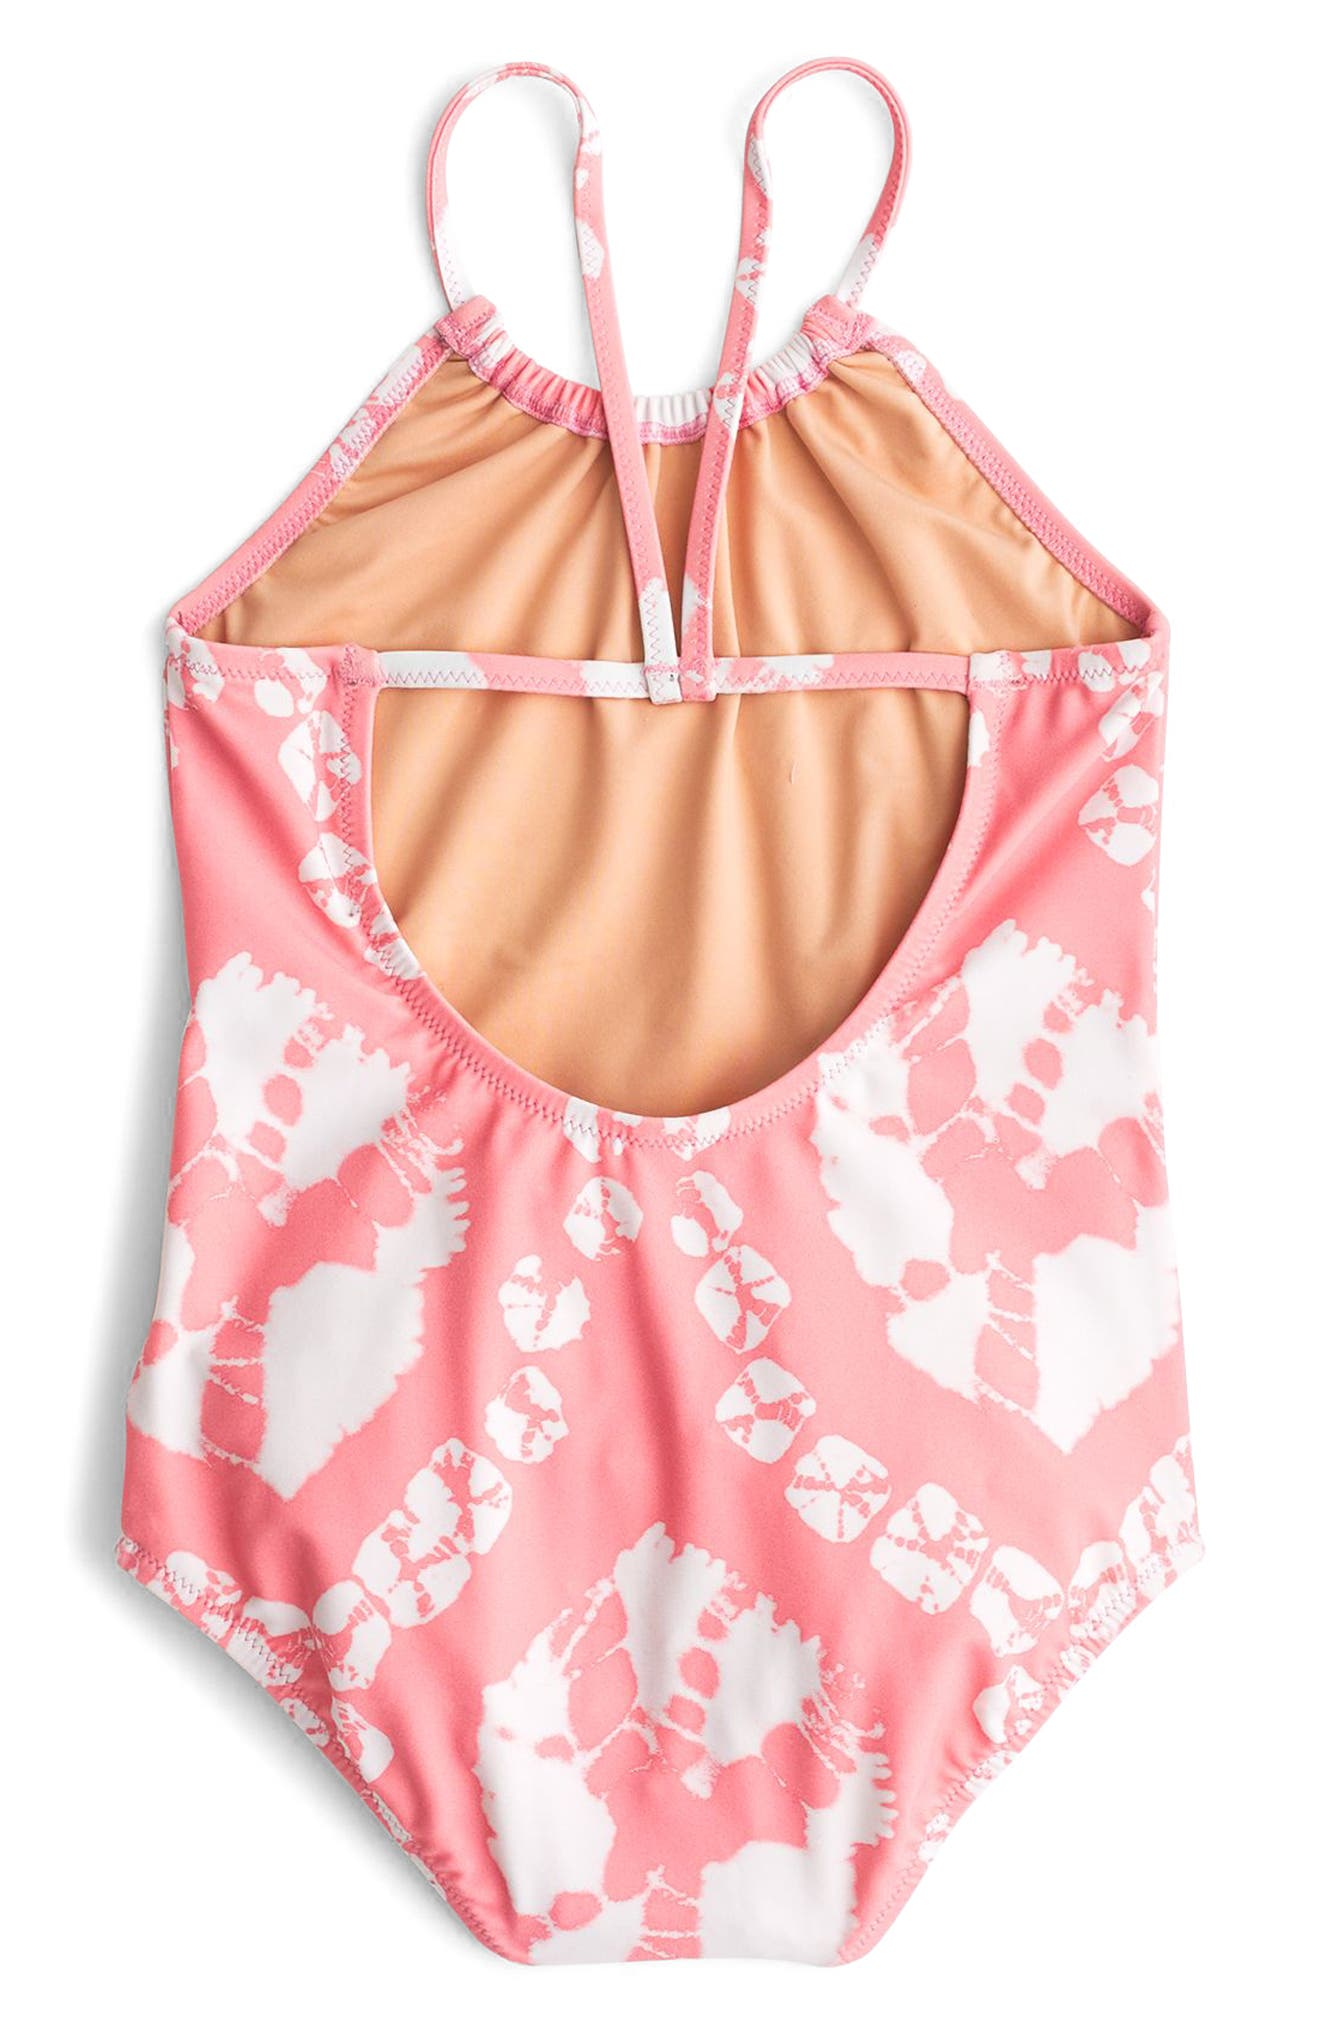 Tie Dye One-Piece Swimsuit,                             Alternate thumbnail 2, color,                             Pink Orange Multi Ka3139